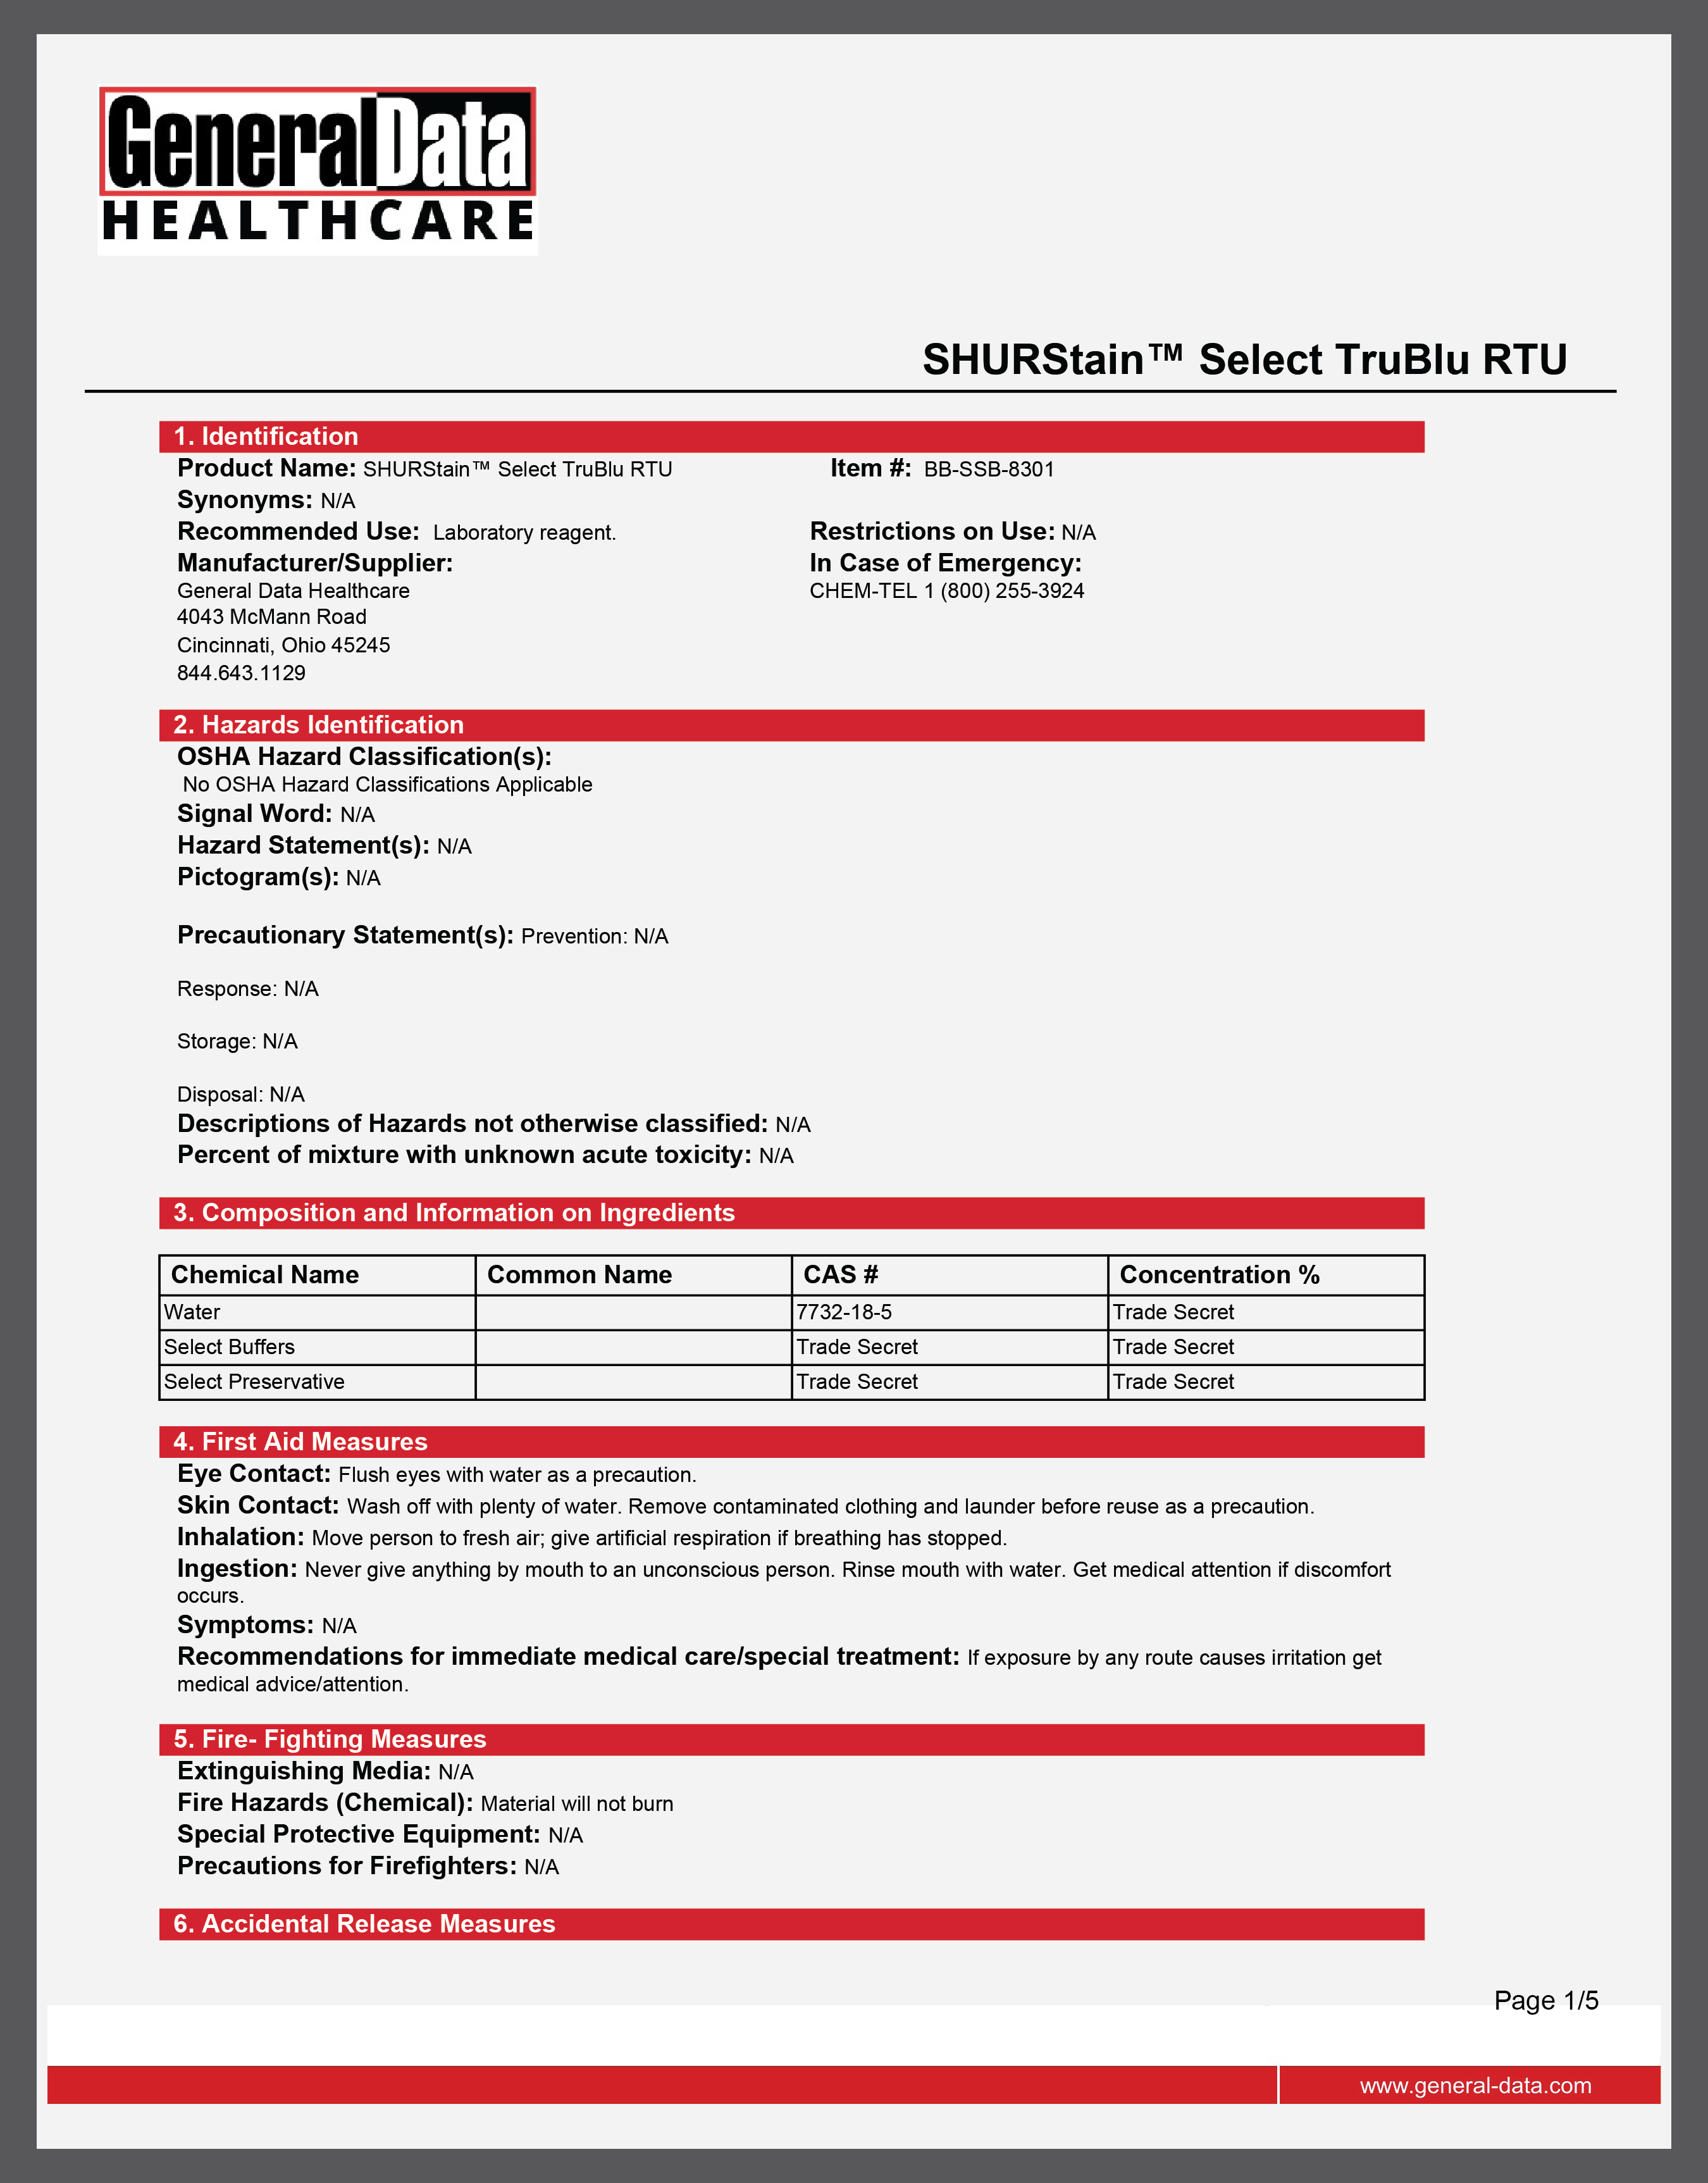 SHURStain Select TruBlu RTU Safety Data Sheet